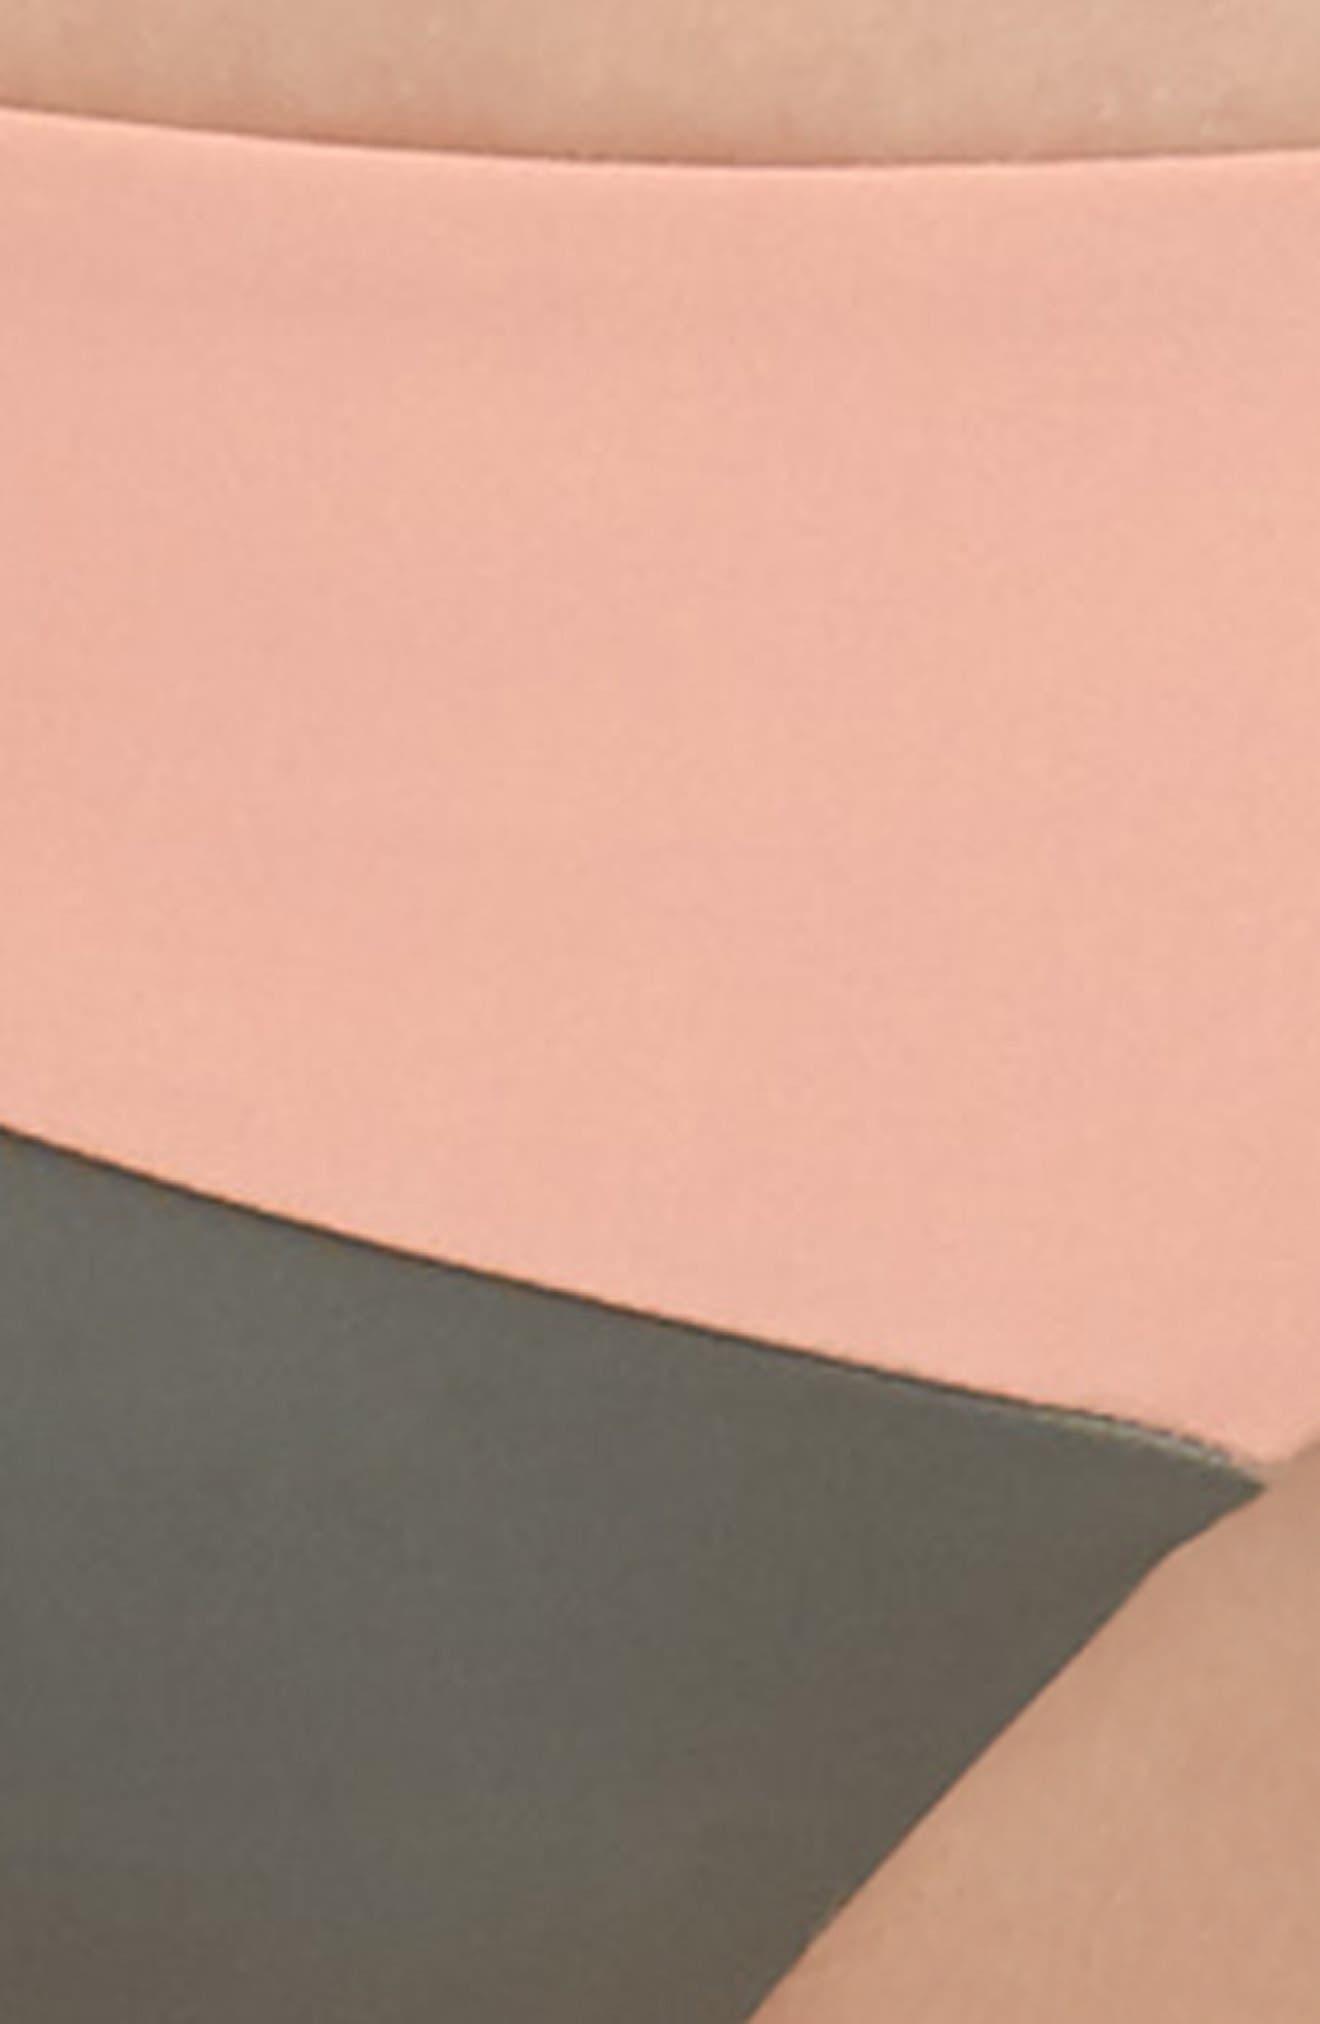 Jaclyn Hipster Bikini Bottoms,                             Alternate thumbnail 8, color,                             Desert Clay/ Cove Grey